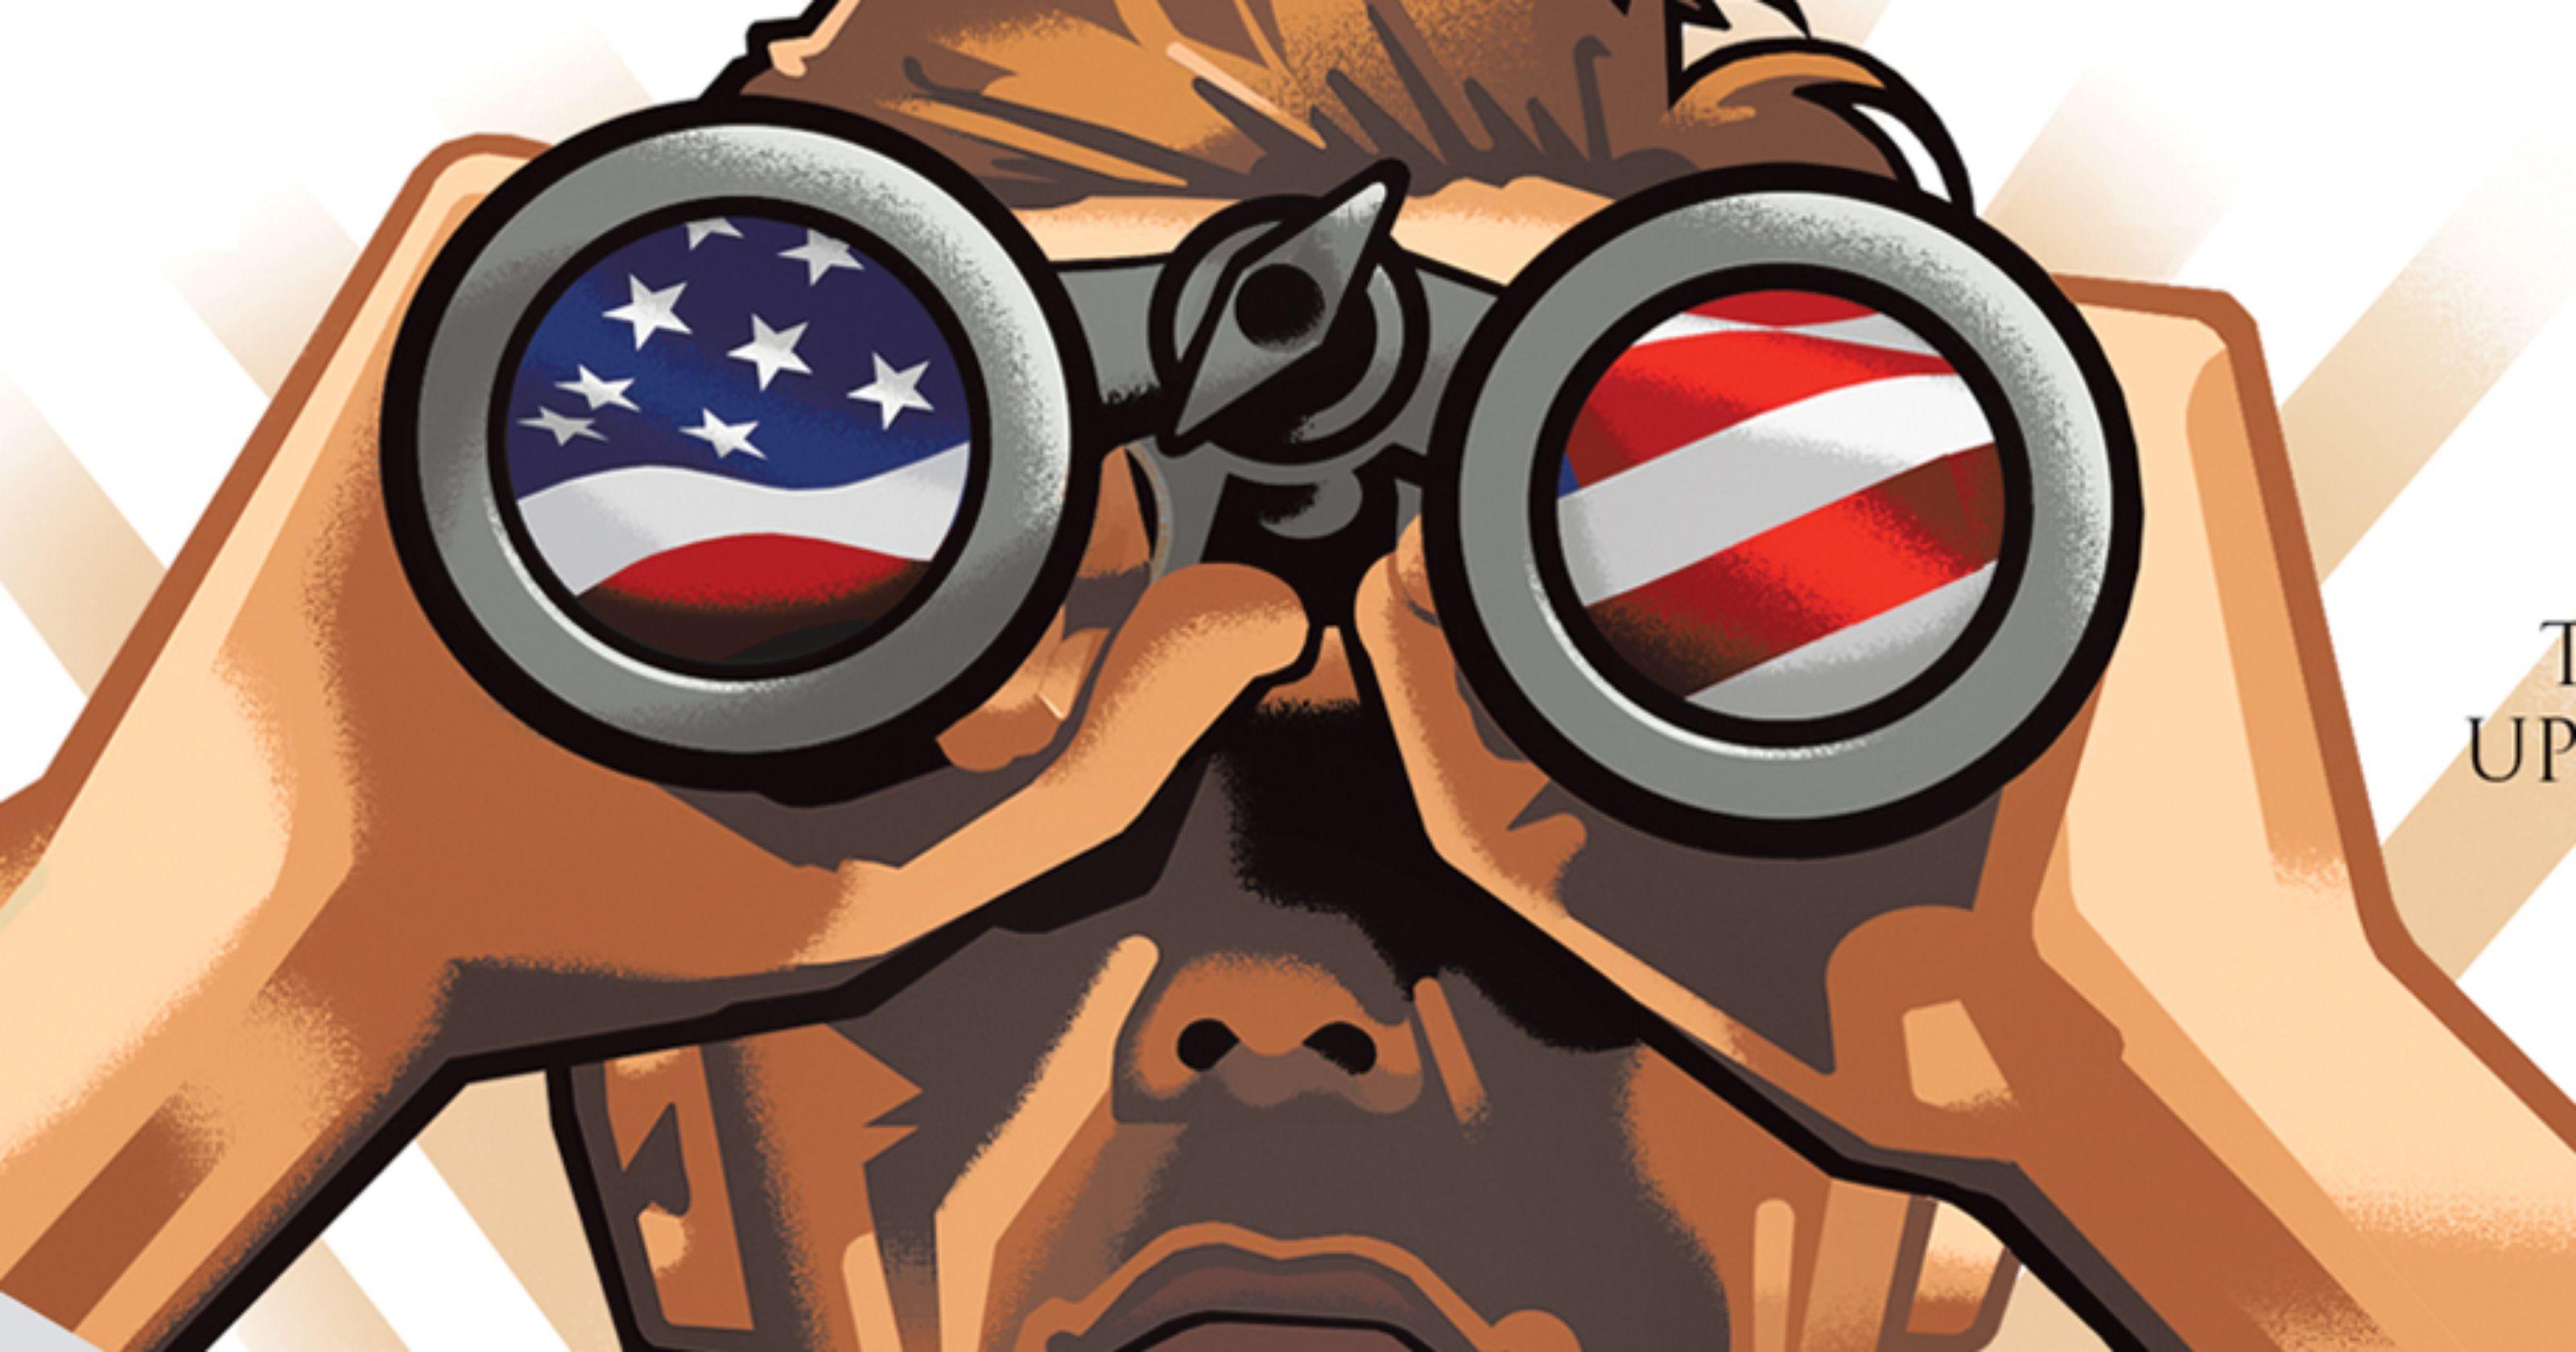 Binoculars clipart scrutiny. State of the race